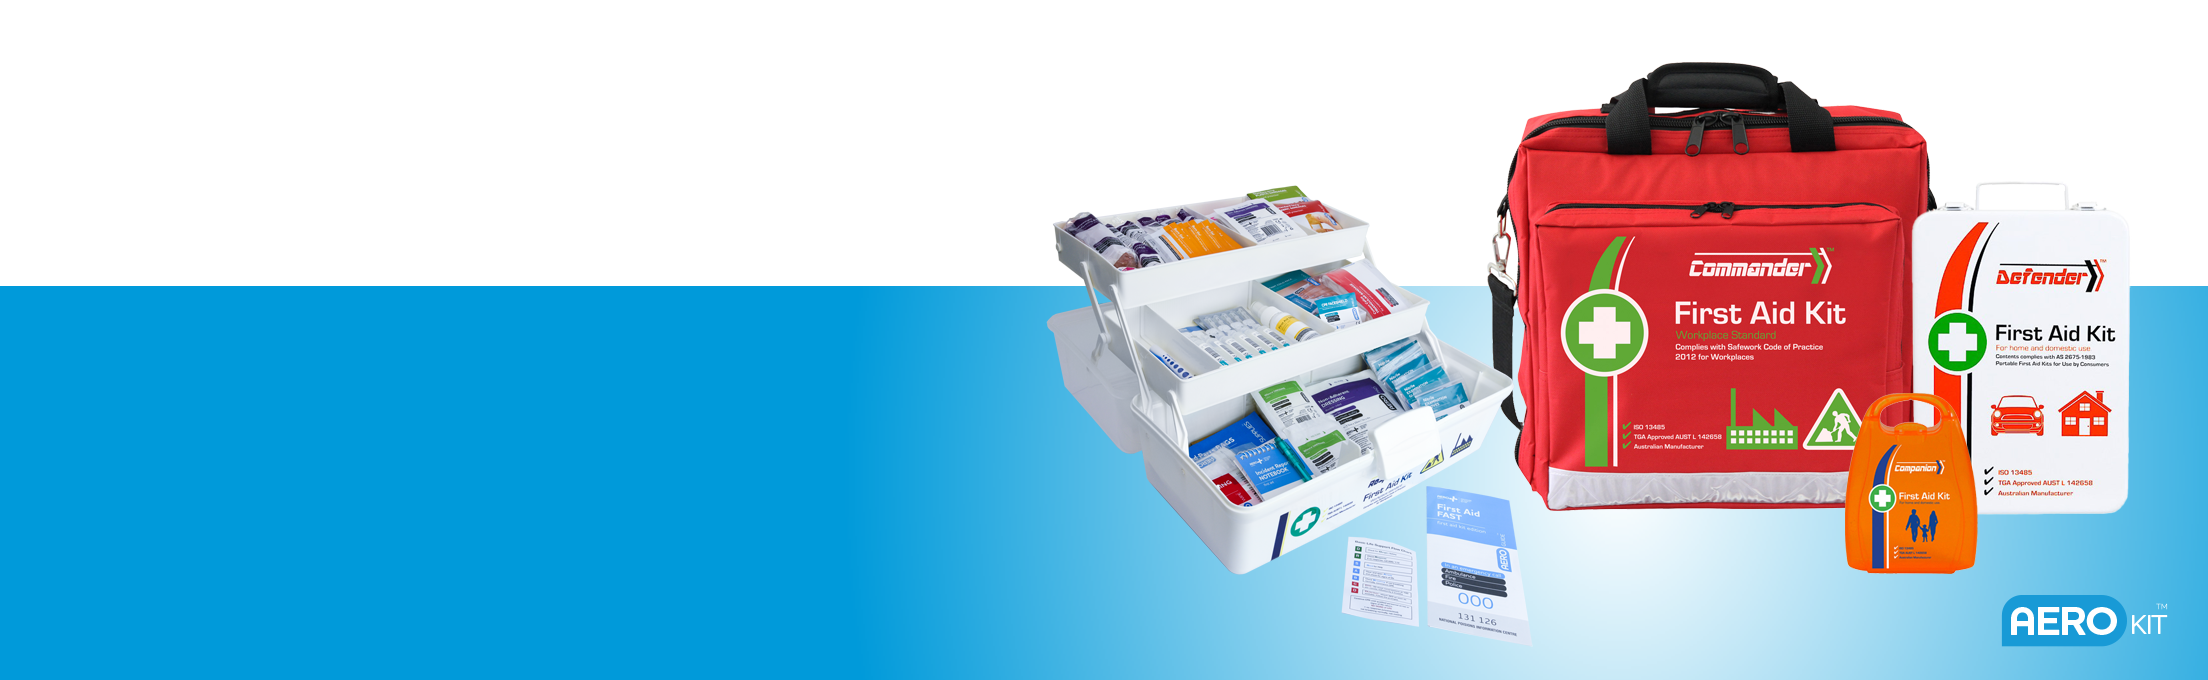 Image of the range of Aero Healthcare First Aid Kit range AeroKit